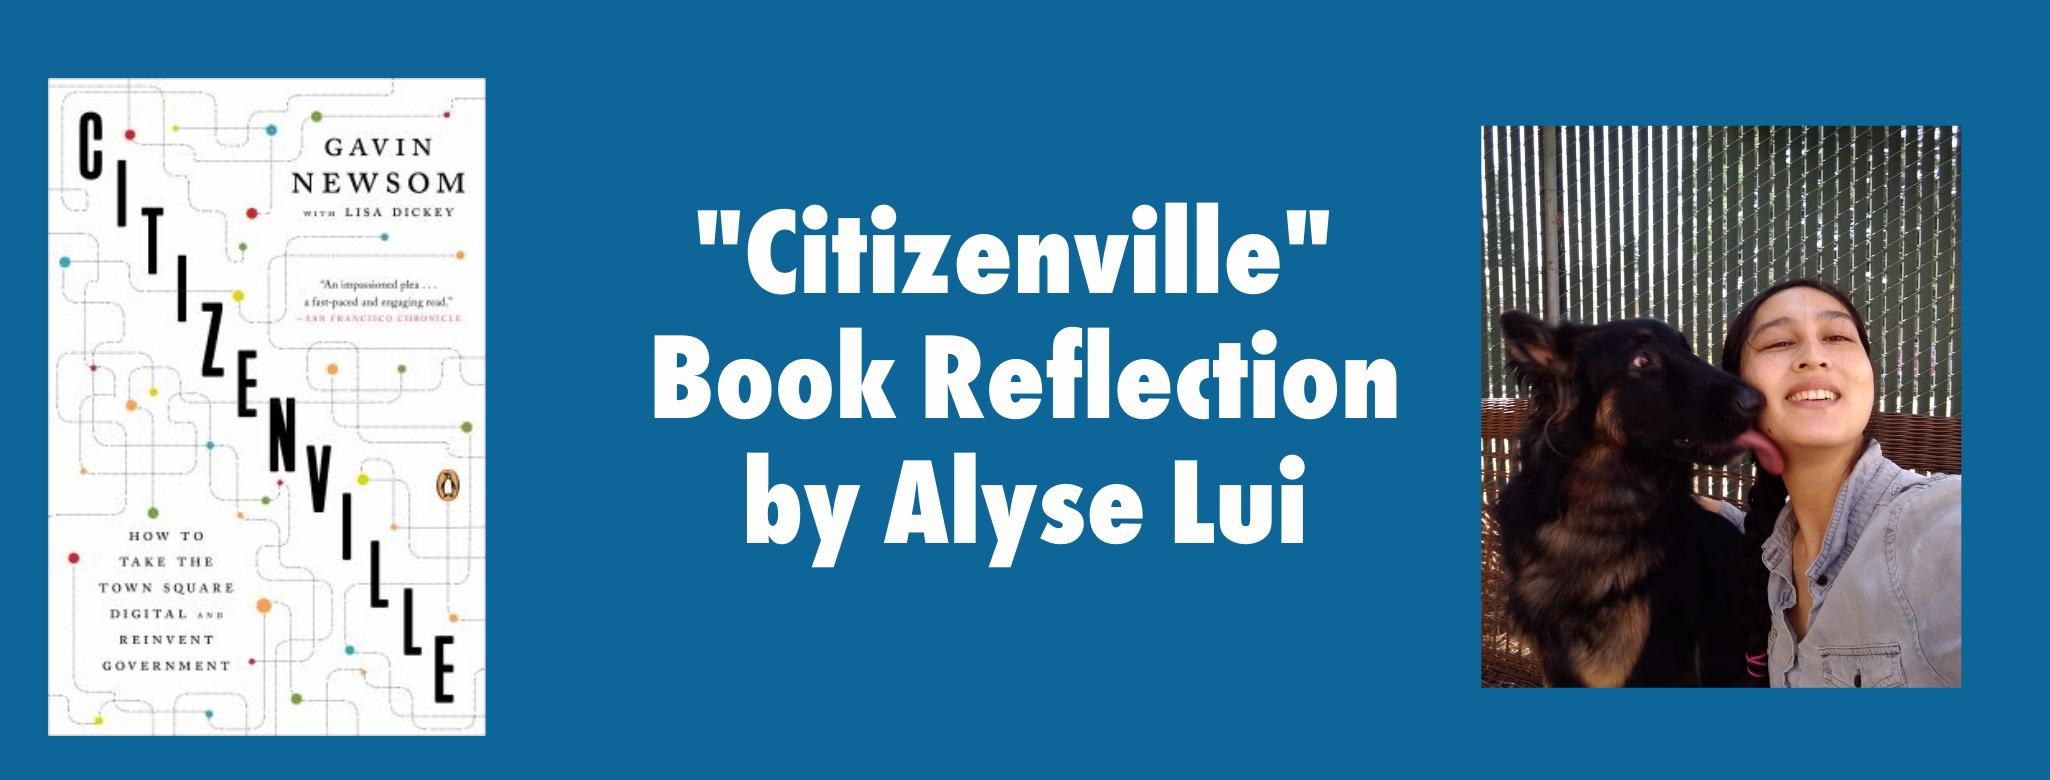 Citizenville Book Reflection